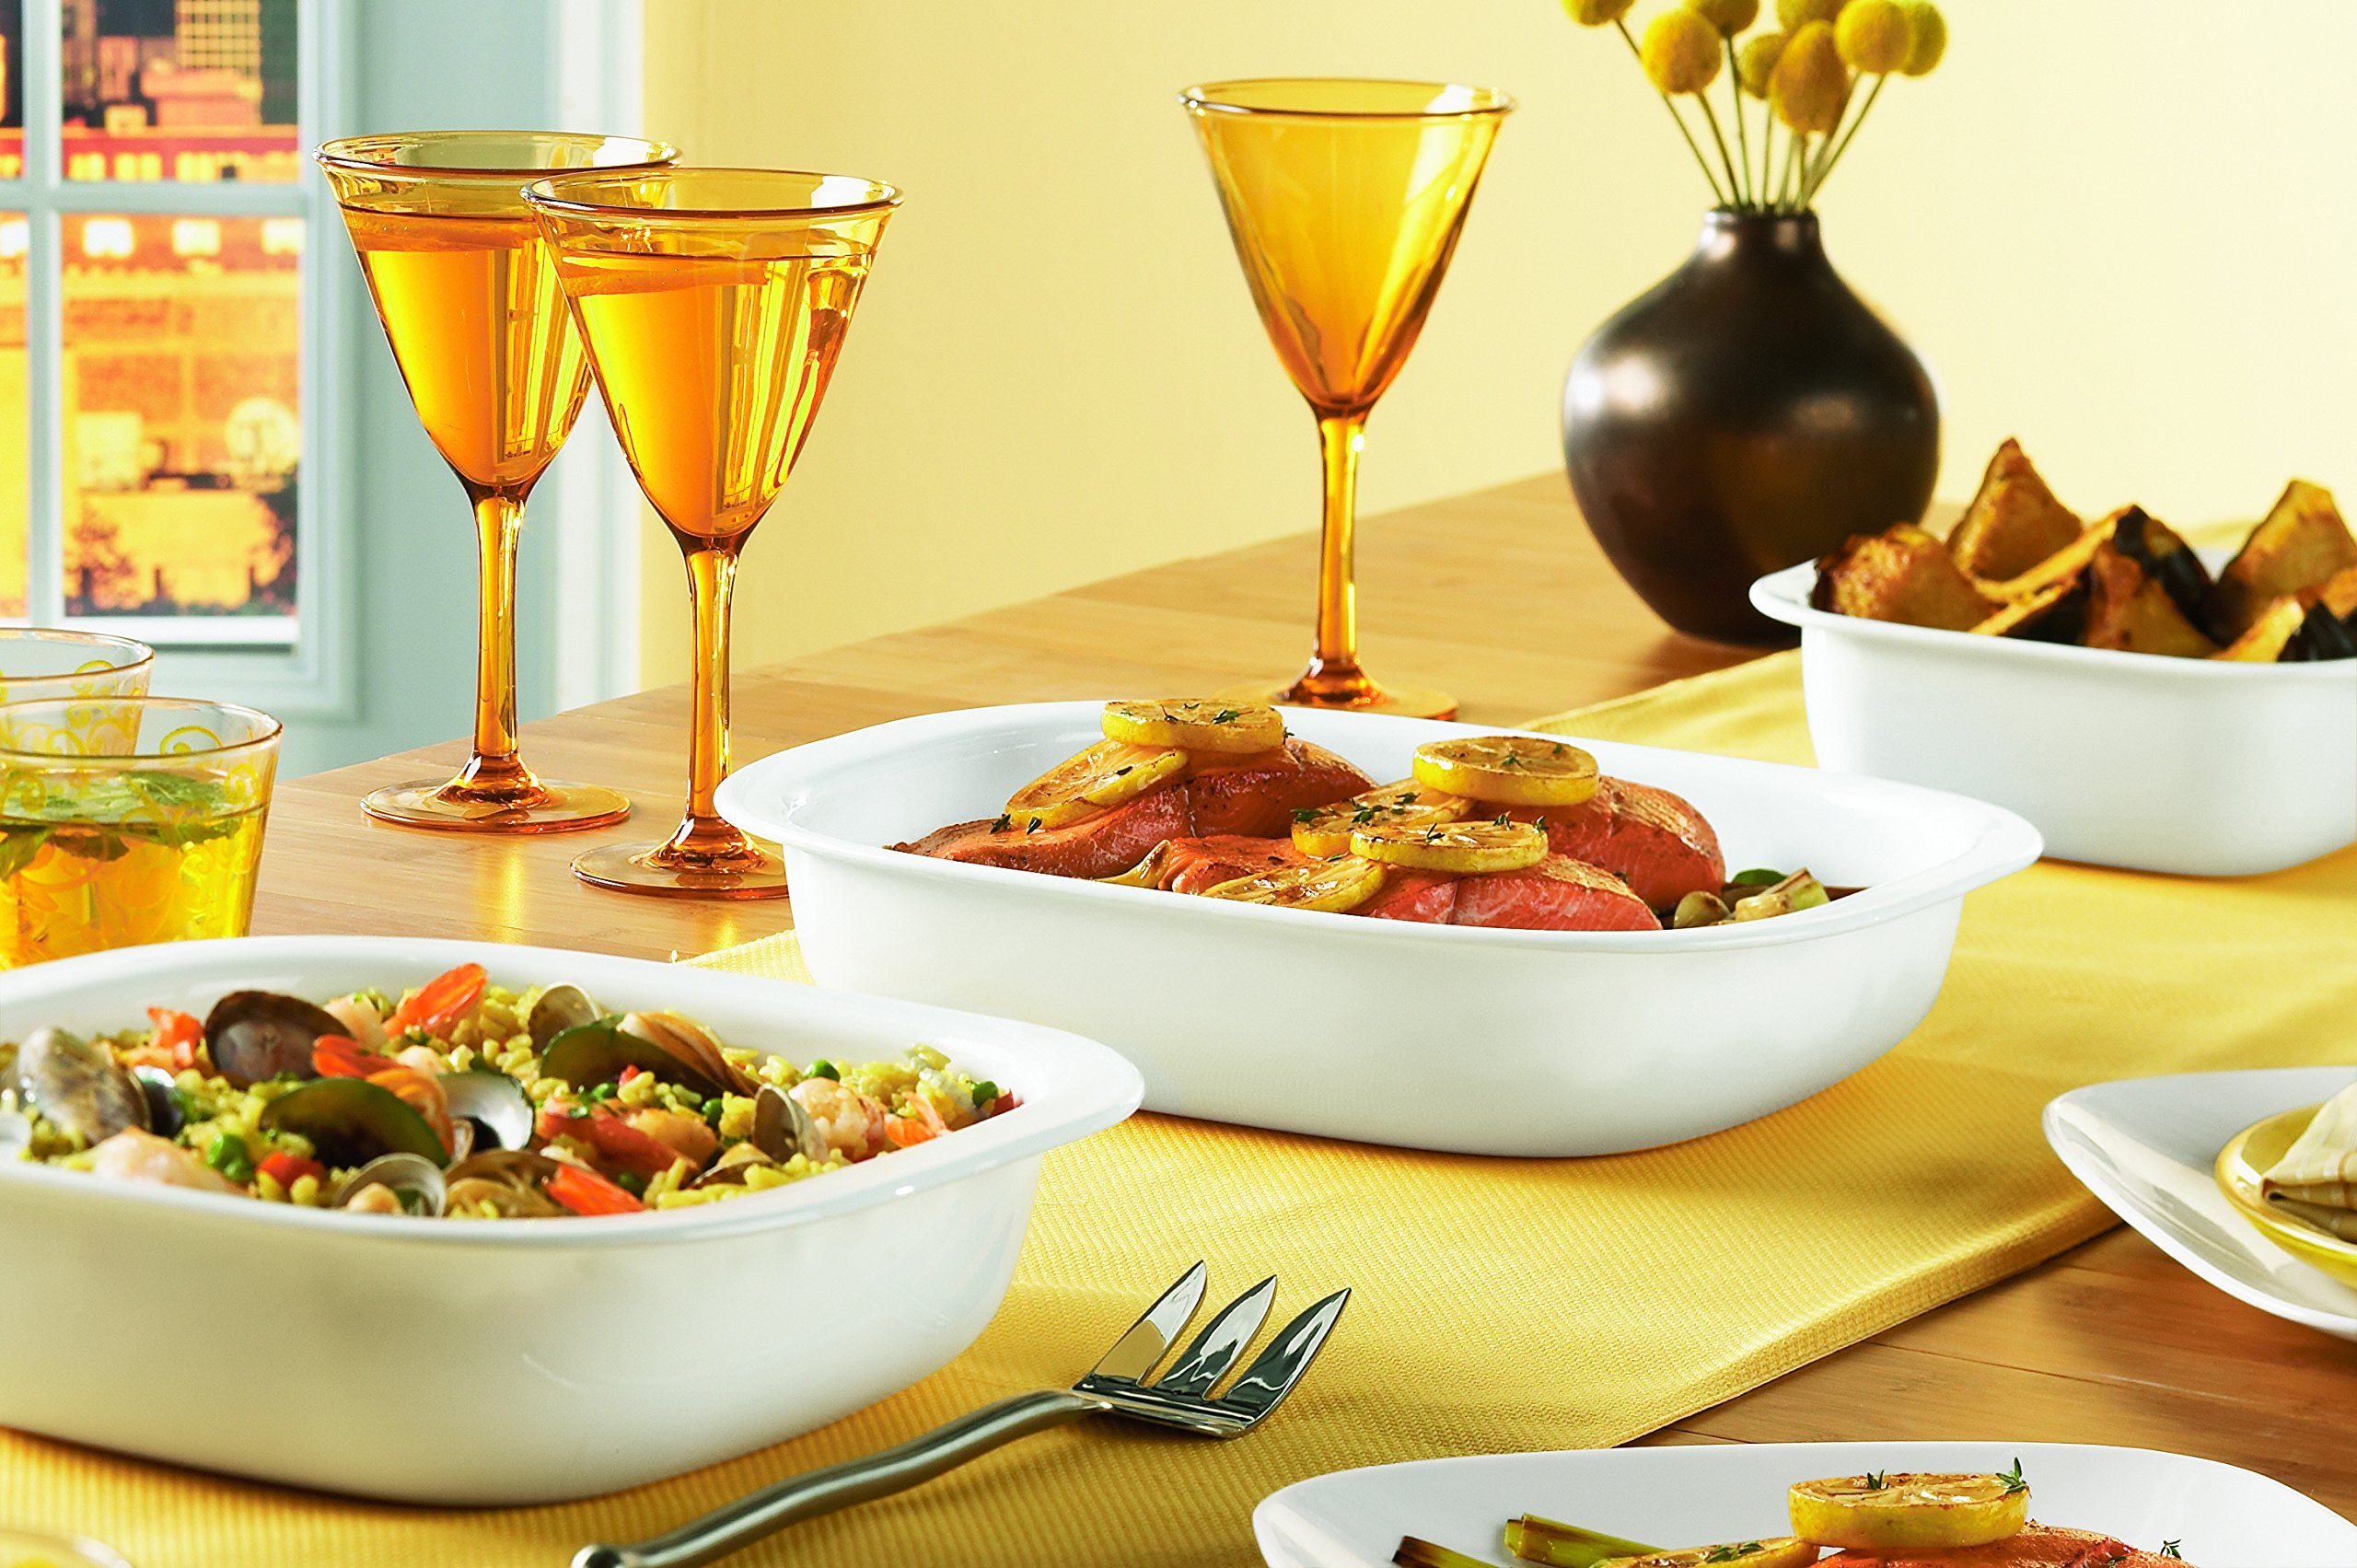 CorningWare SimplyLite 3-Quart Oblong Baking Dish with Plastic Lid by CorningWare (Image #2)